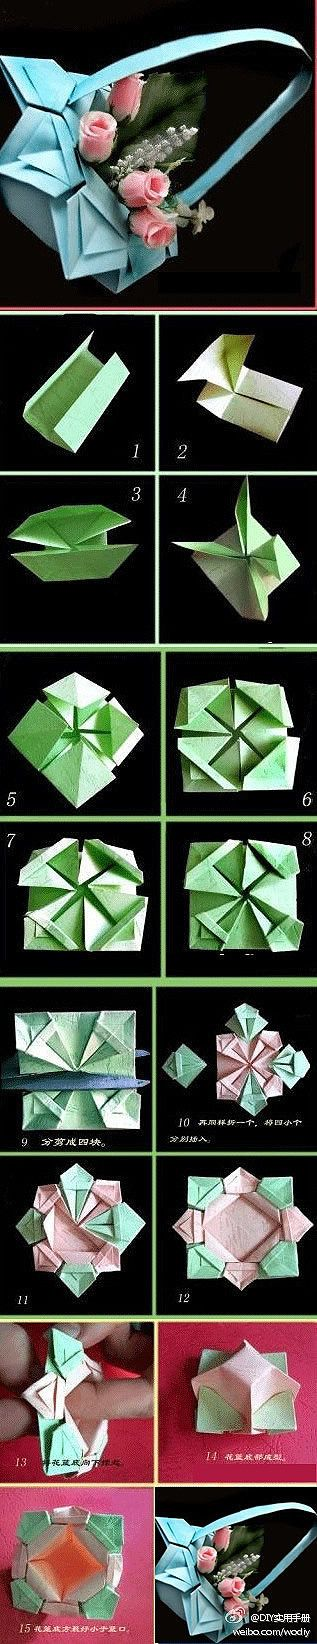 Origami Körbchen